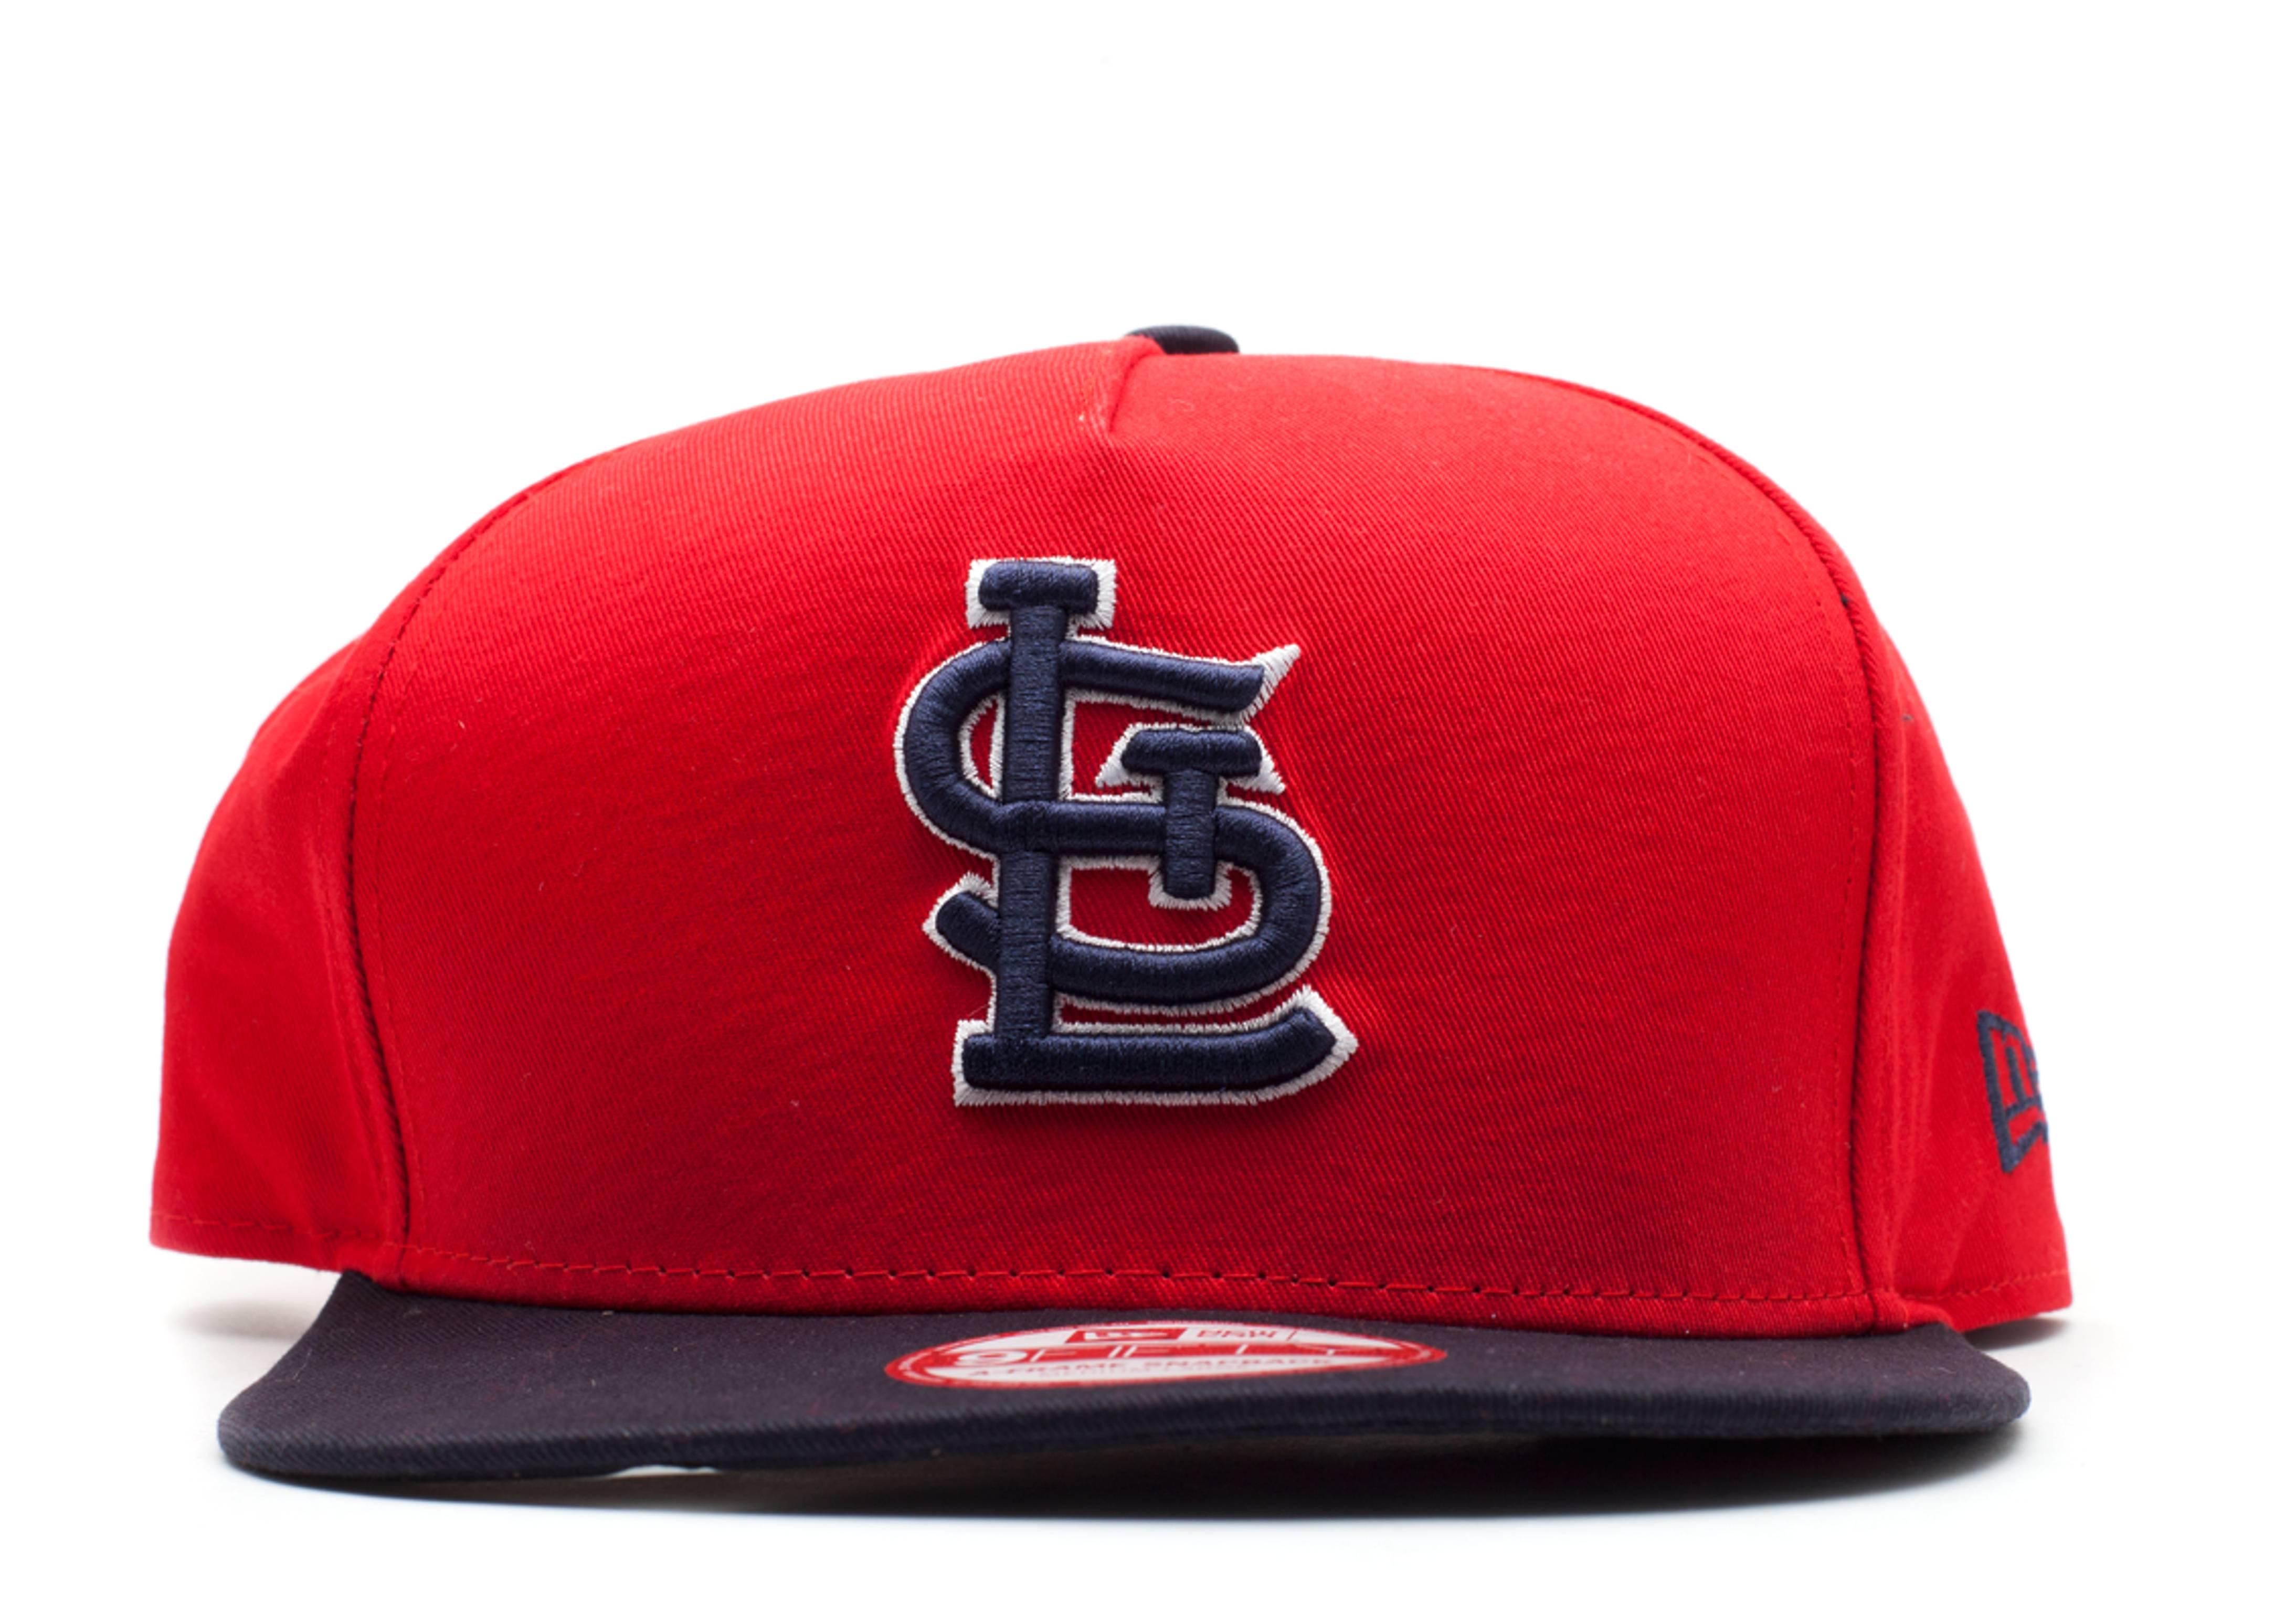 st.louis cardinals snap-back